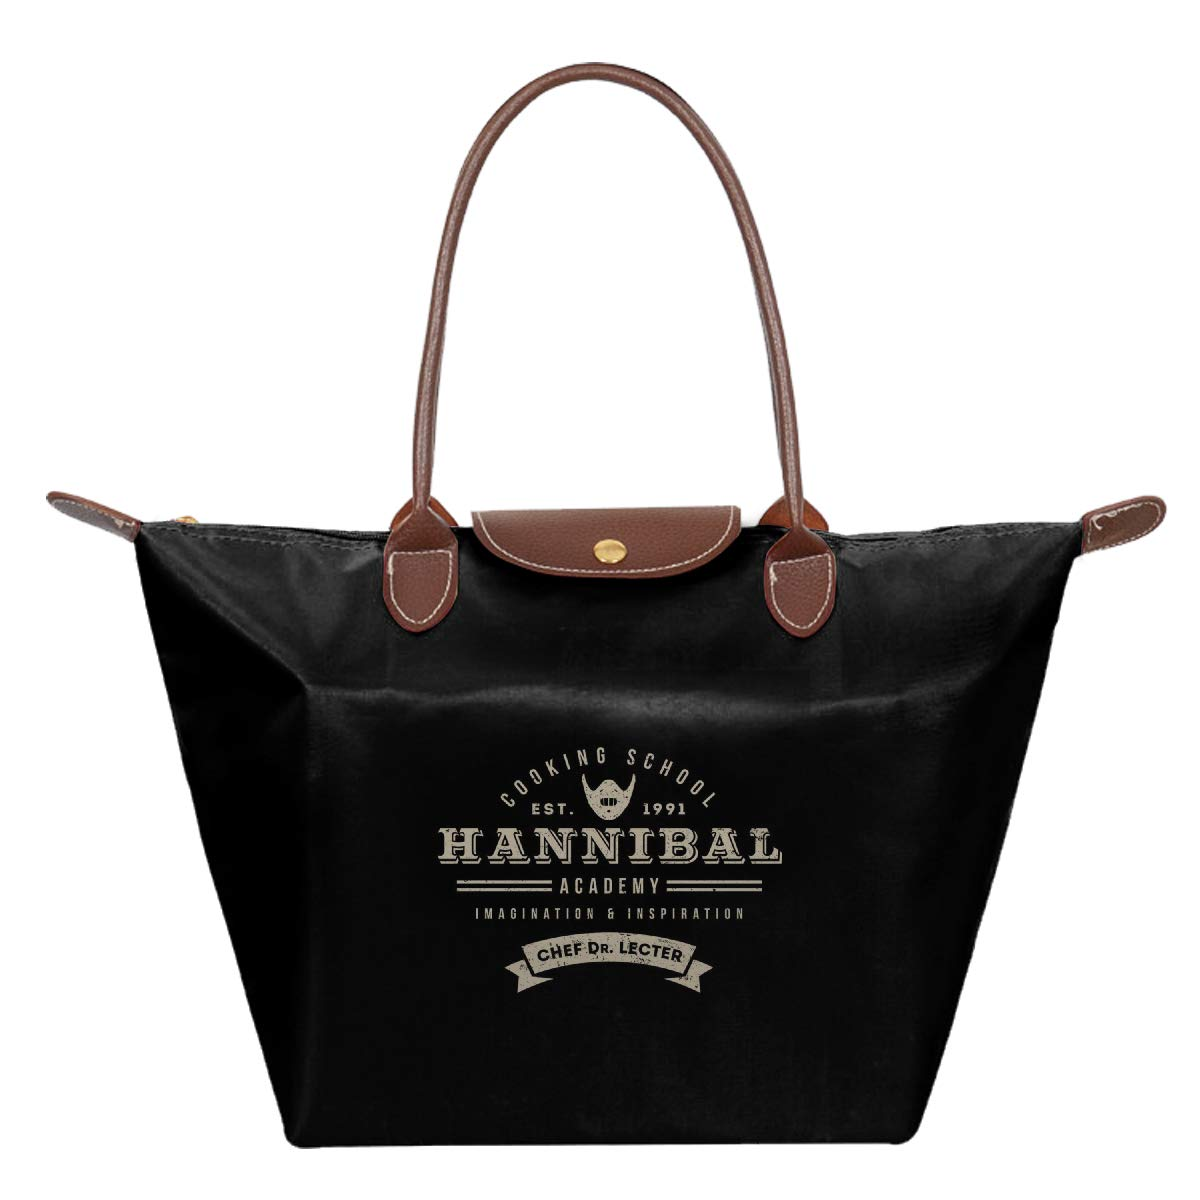 Hannibal Cooking School Chef Dr Lecter Waterproof Leather Folded Messenger Nylon Bag Travel Tote Hopping Folding School Handbags